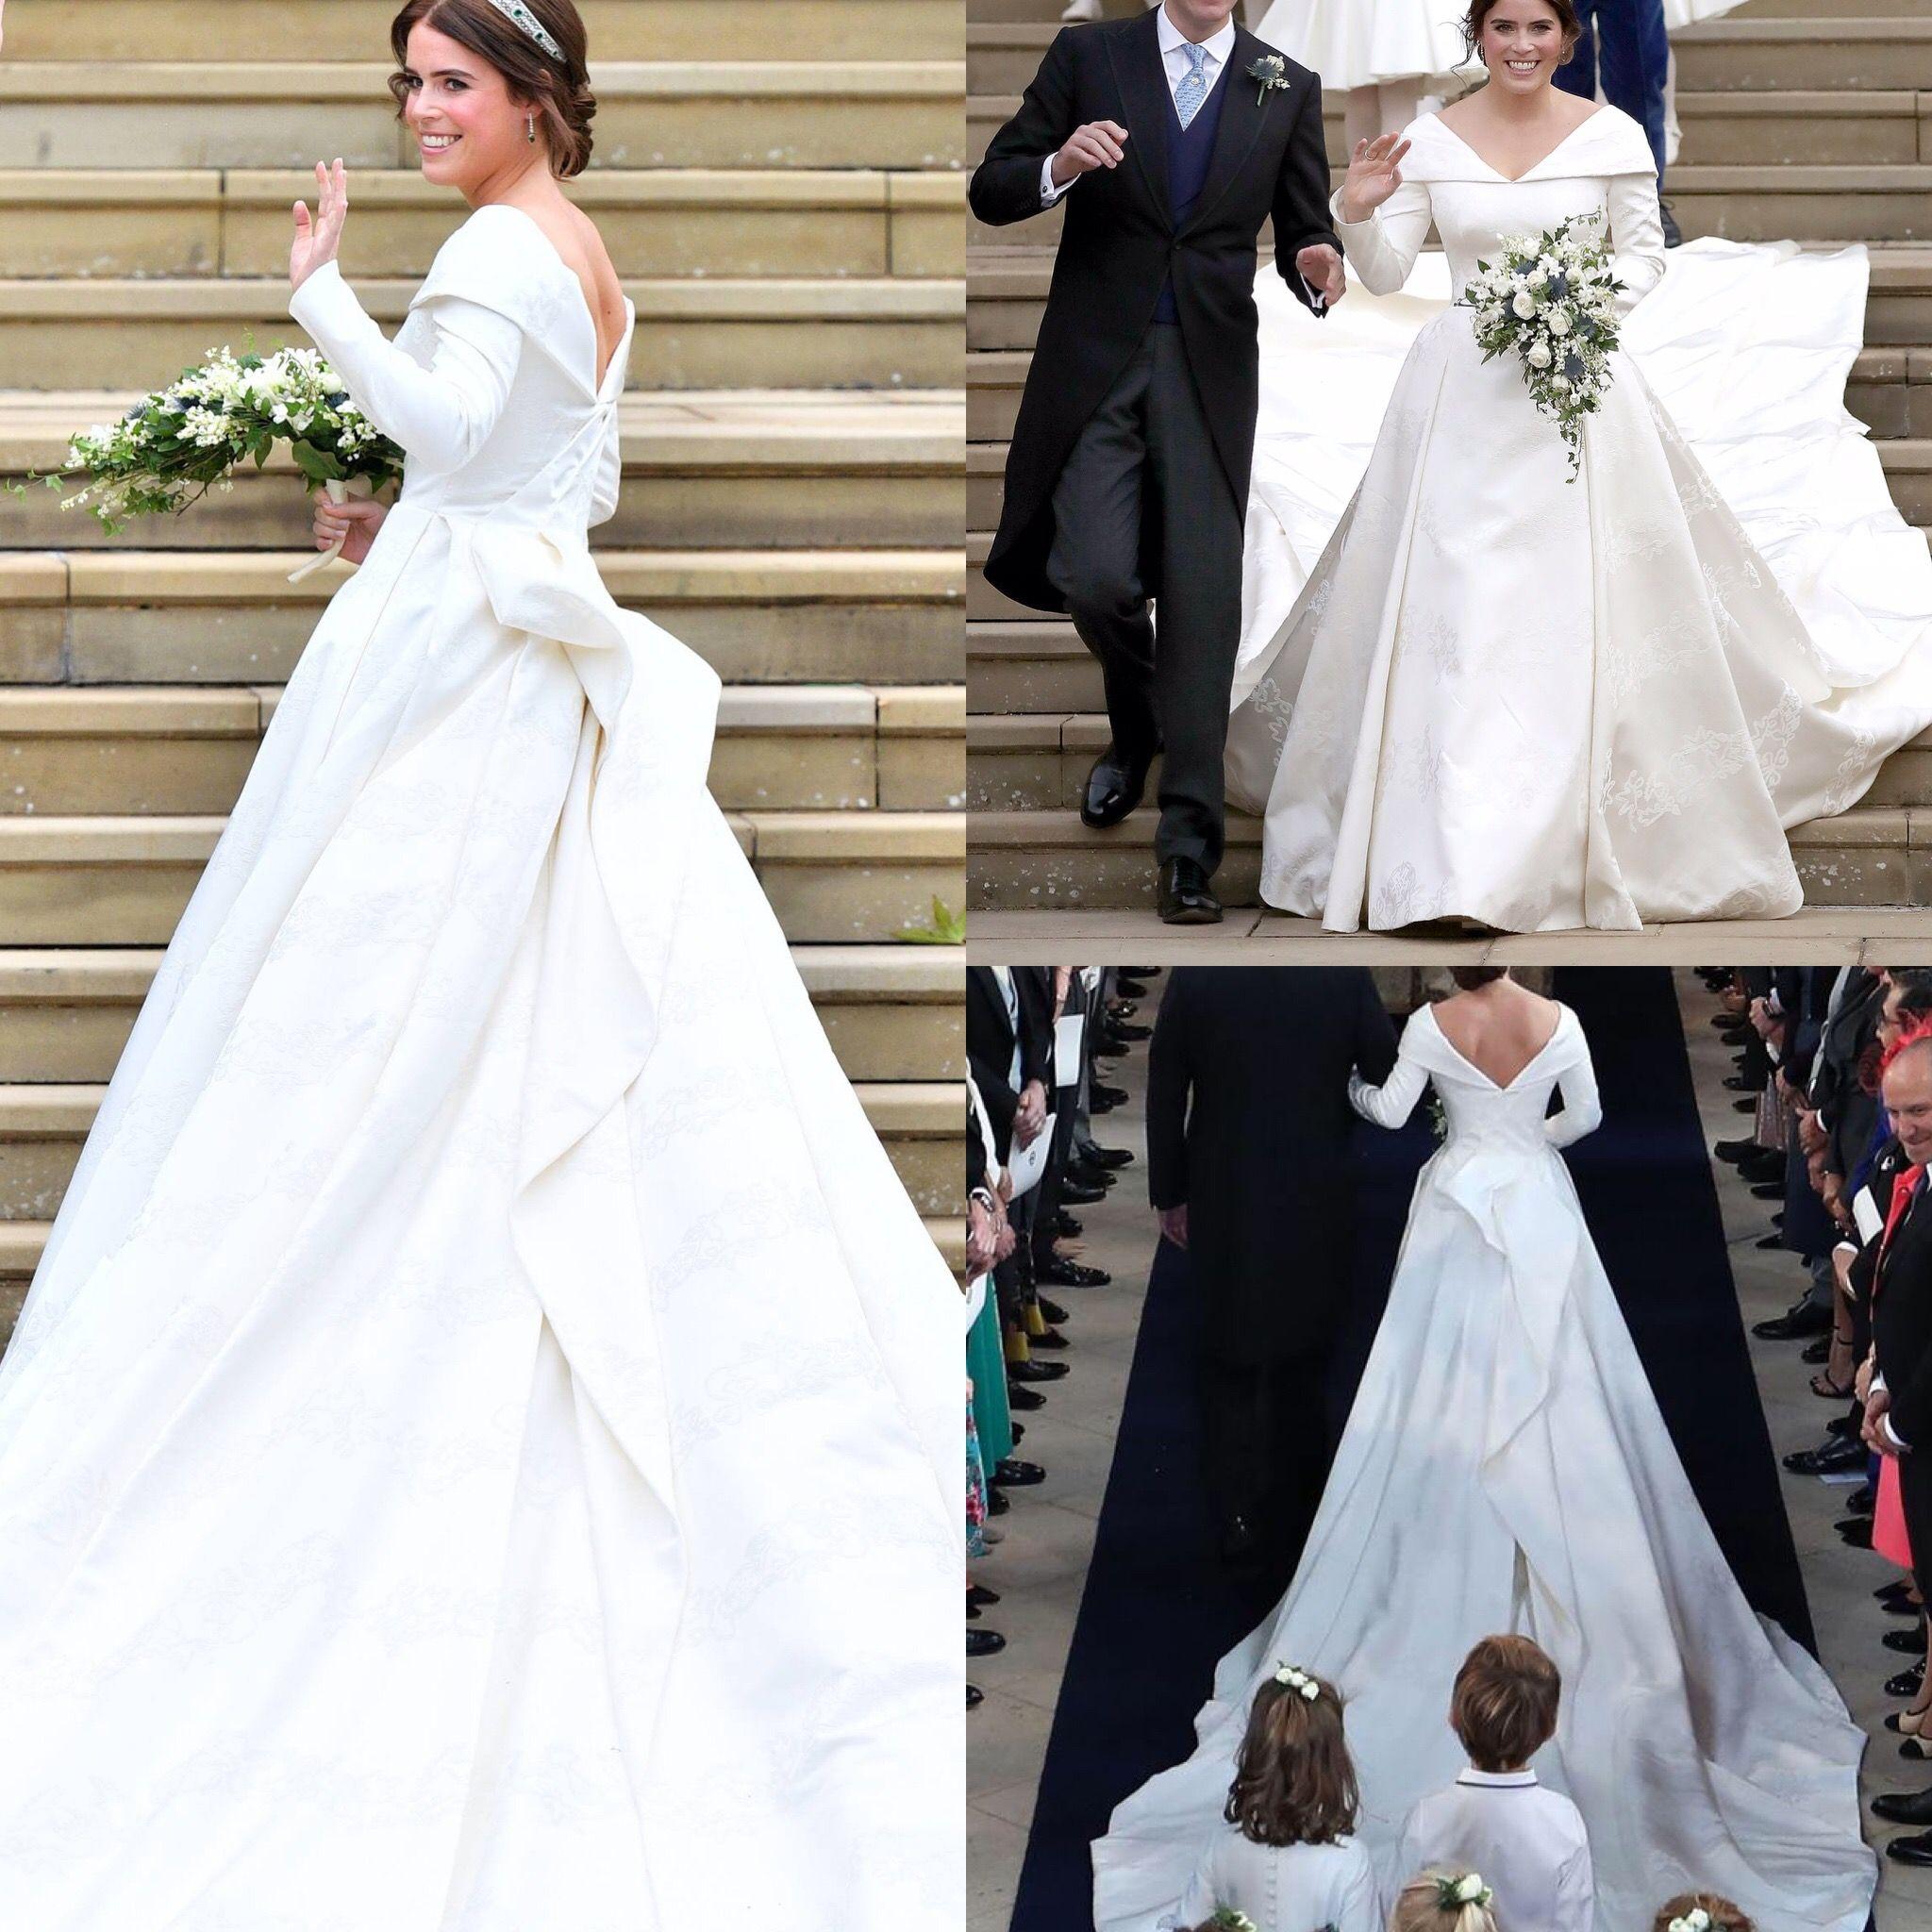 Princess Eugenie Of York This Dress Is Amazing Dream Wedding Dresses Wedding [ 2048 x 2048 Pixel ]